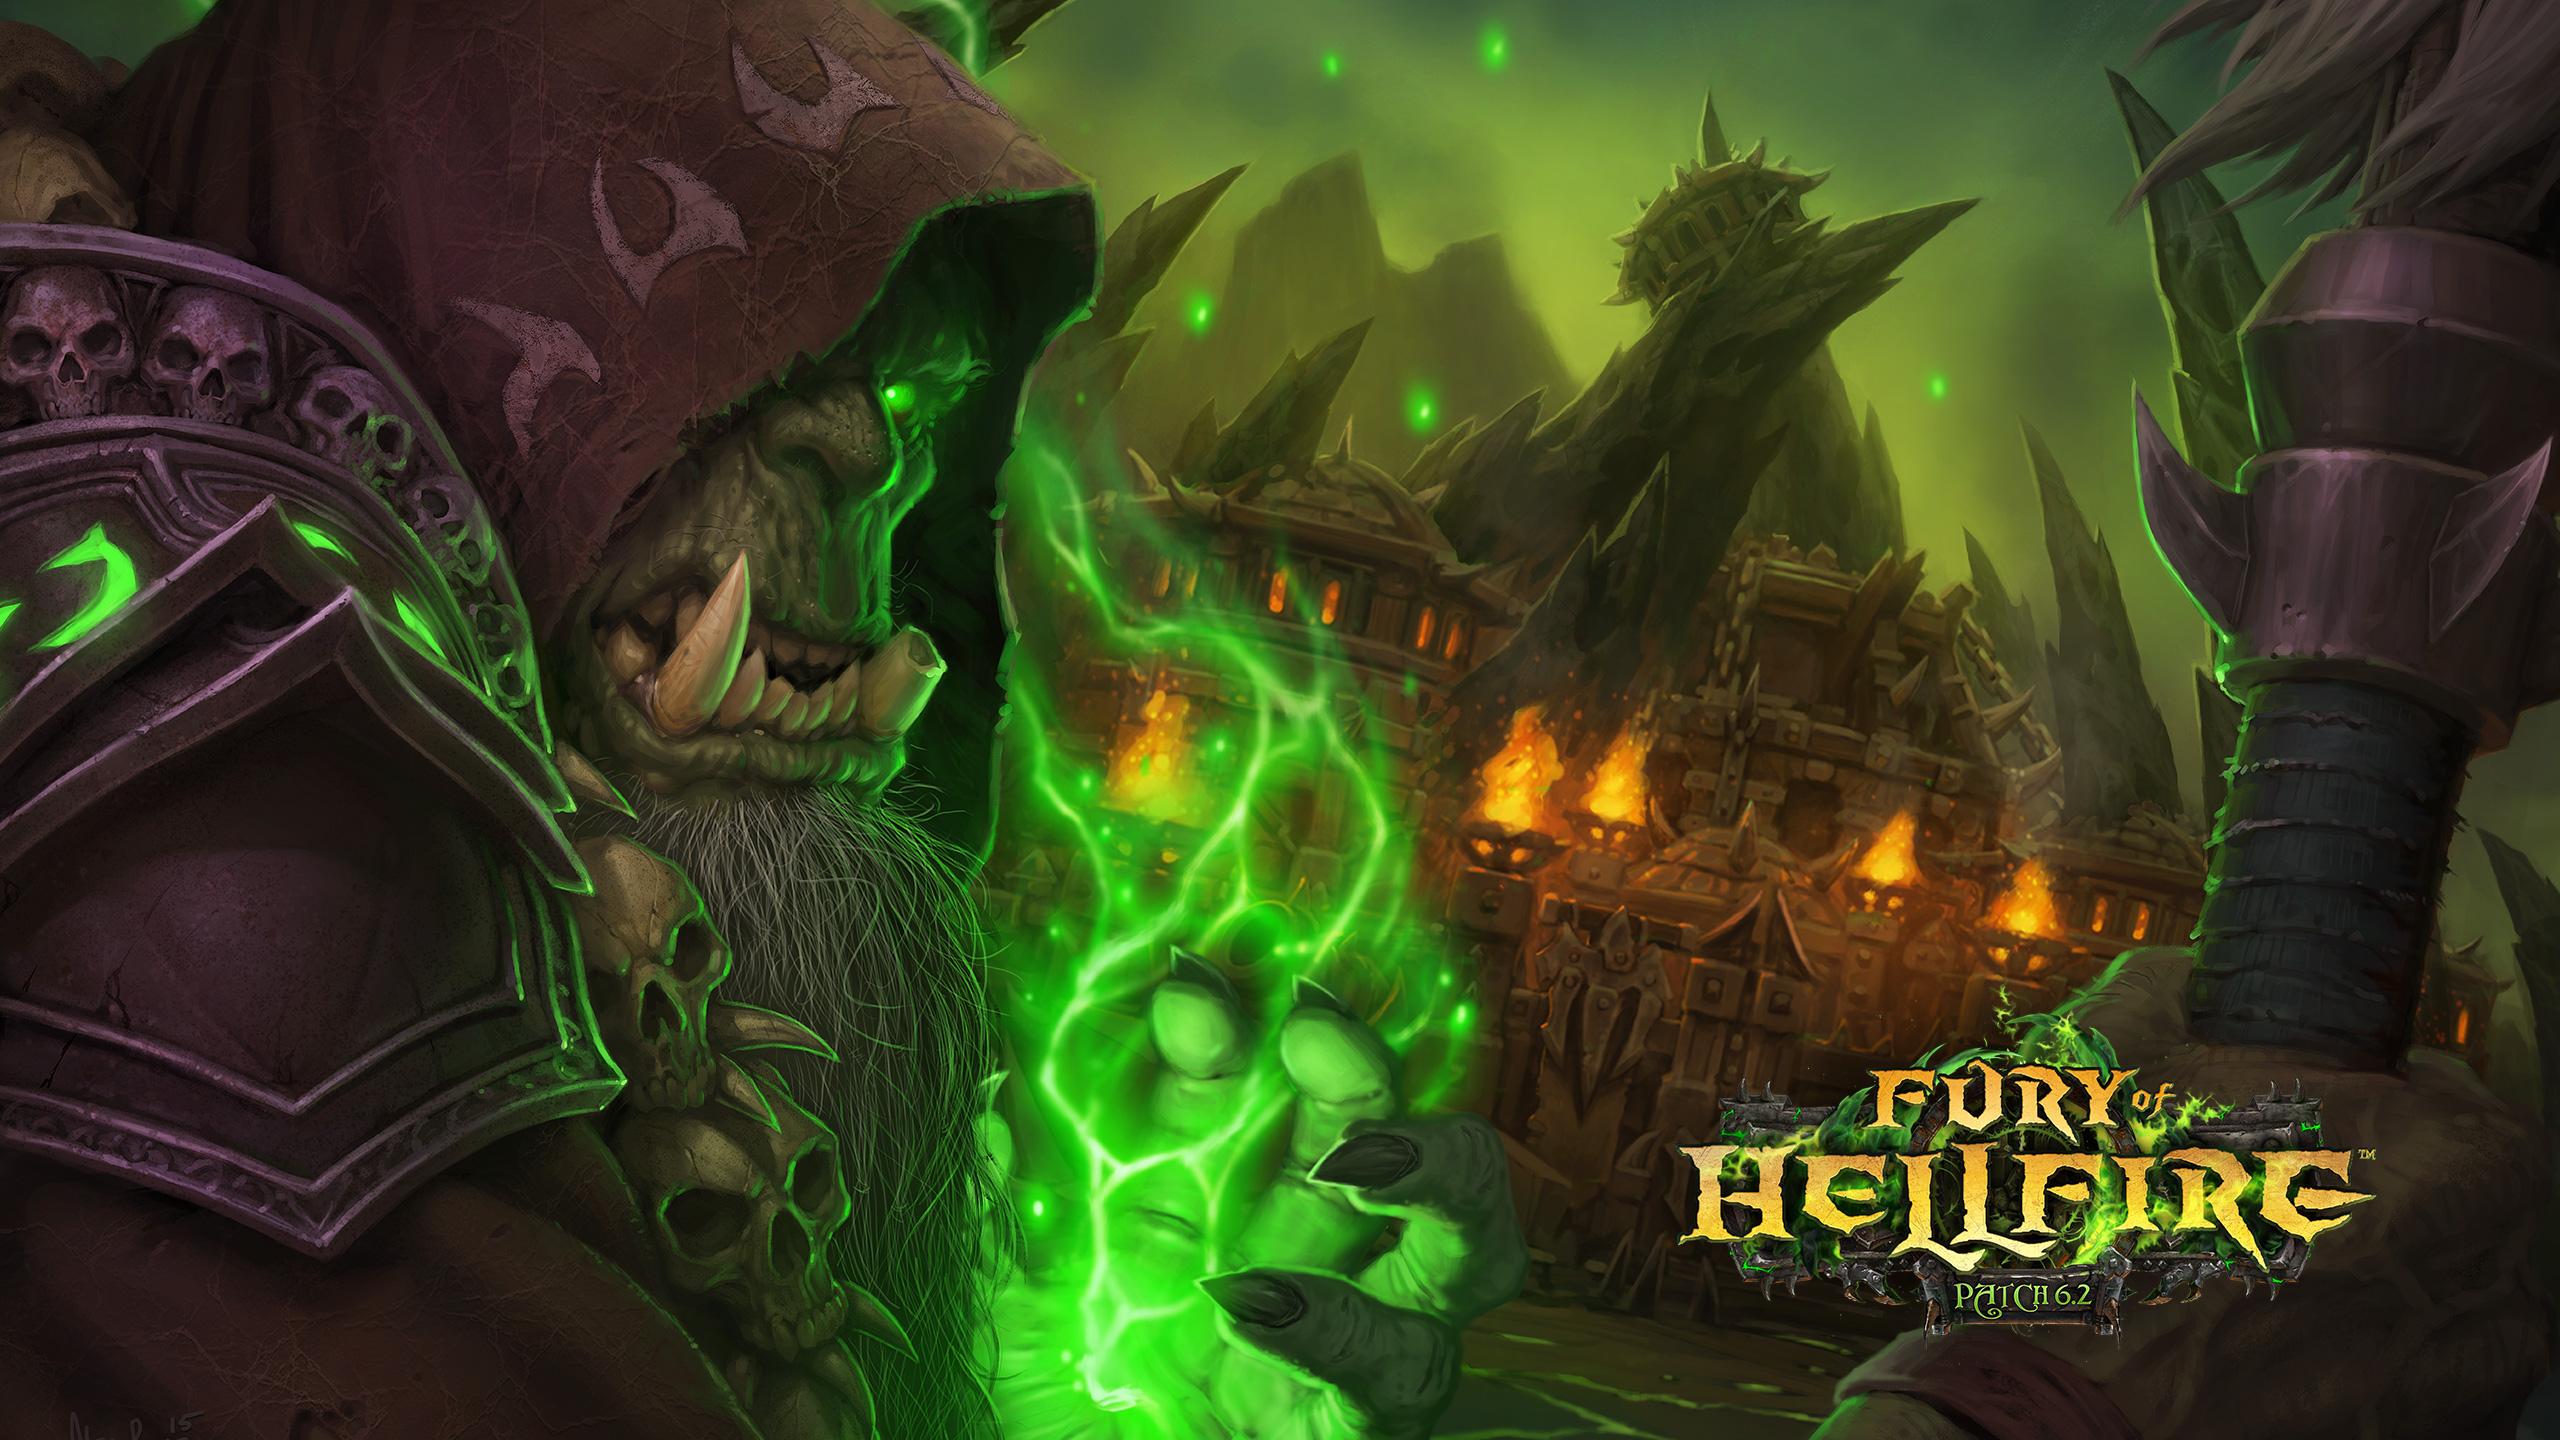 World Of Warcraft Legion Demon Hunter Hd Wallpaper 2560x1440